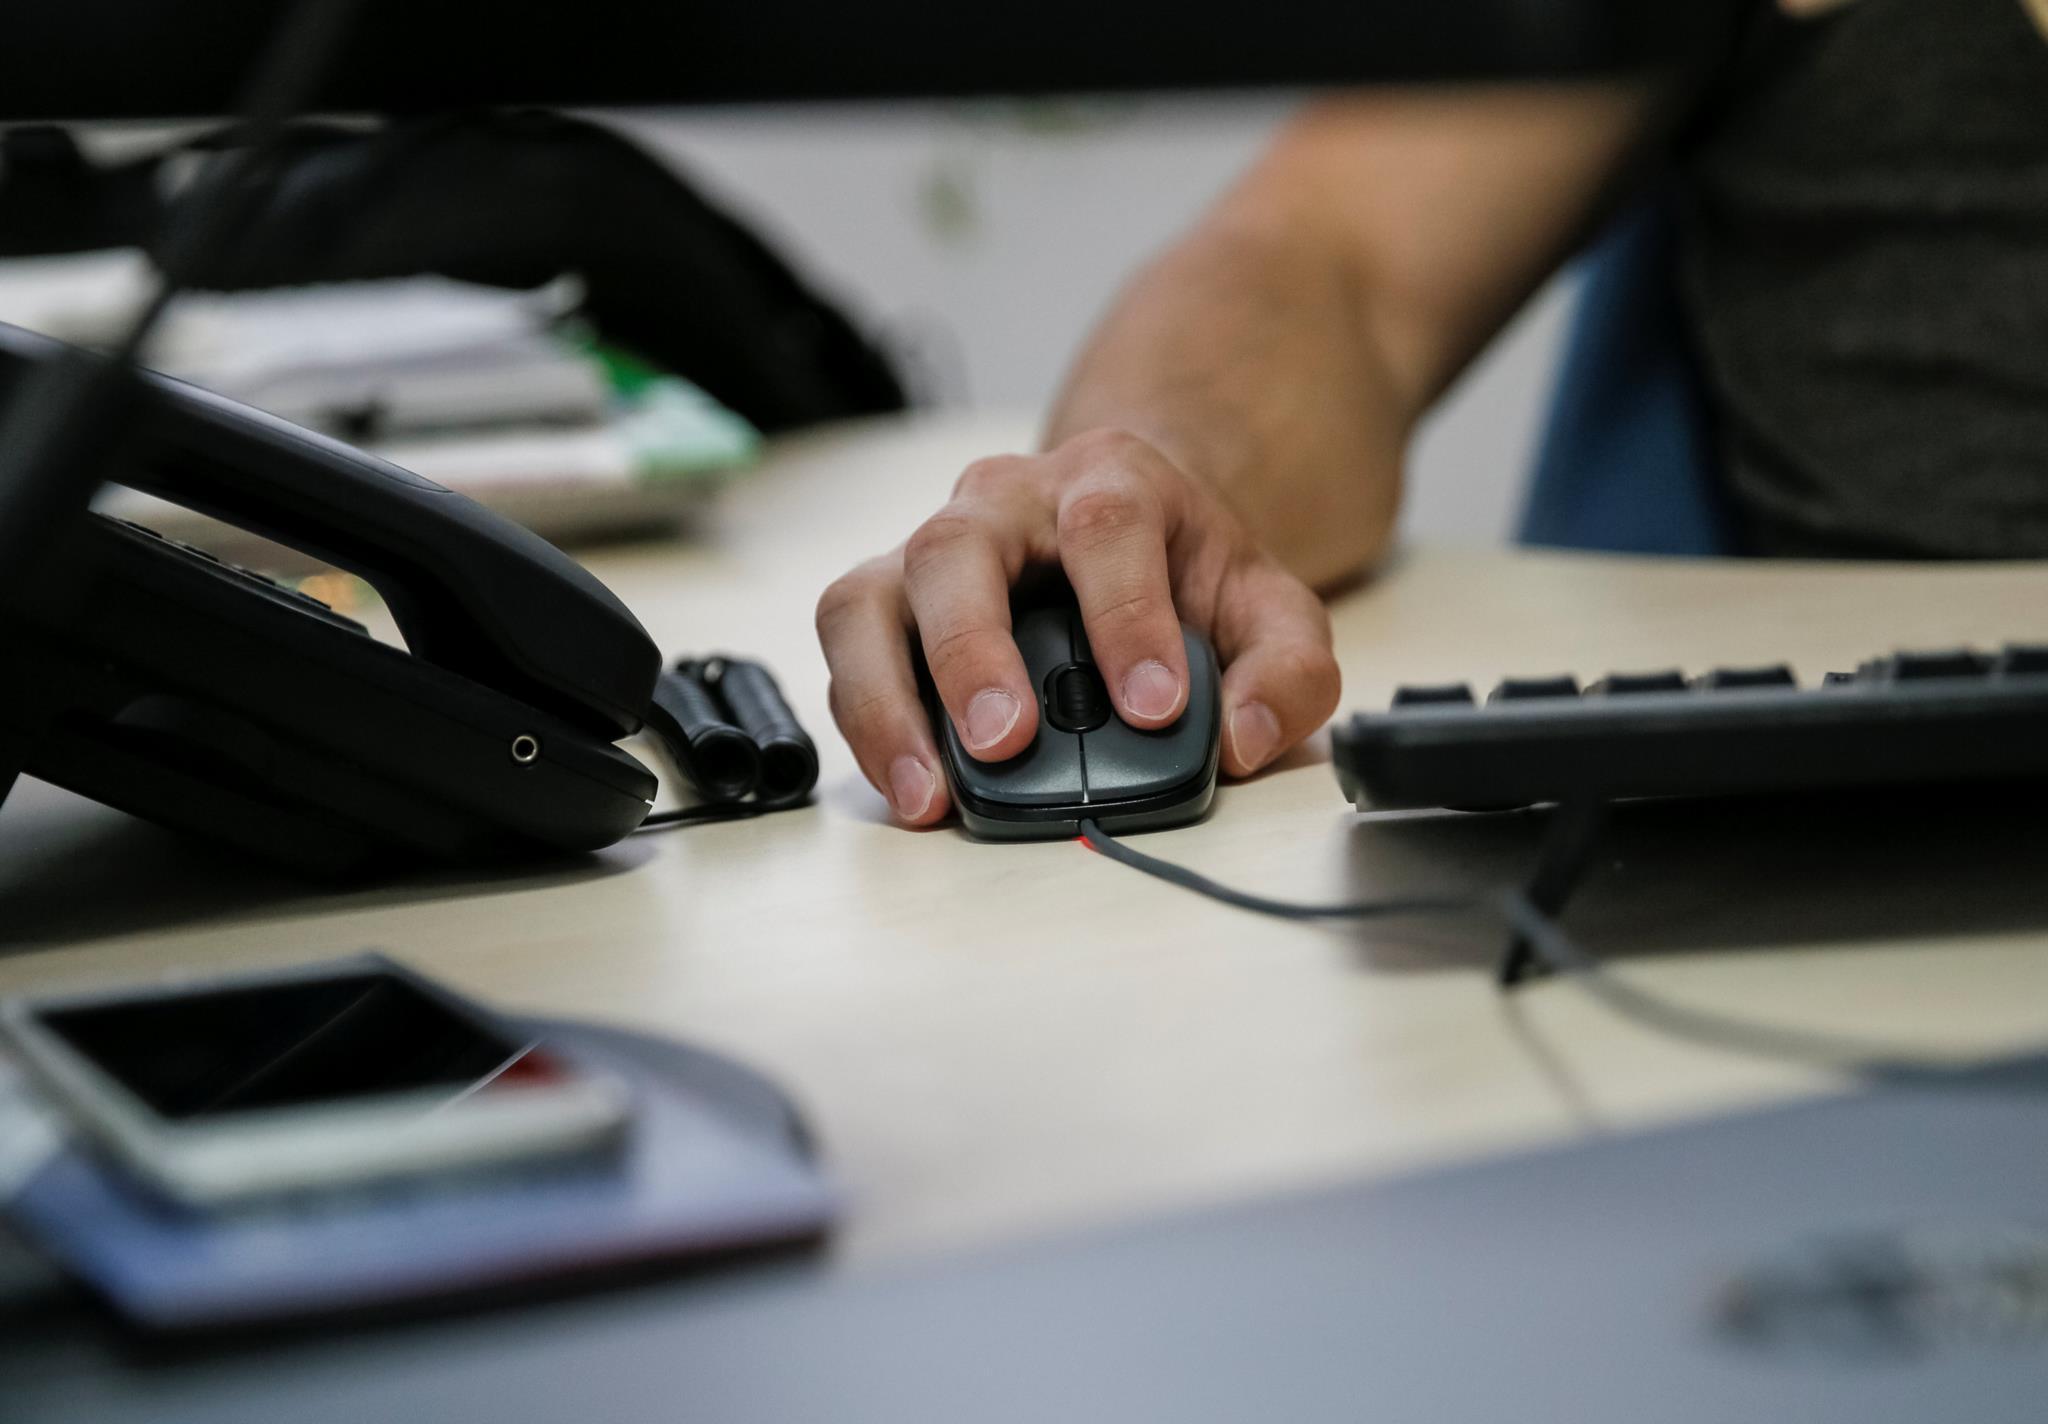 PÚBLICO - Ciberataque paralisa Ucrânia